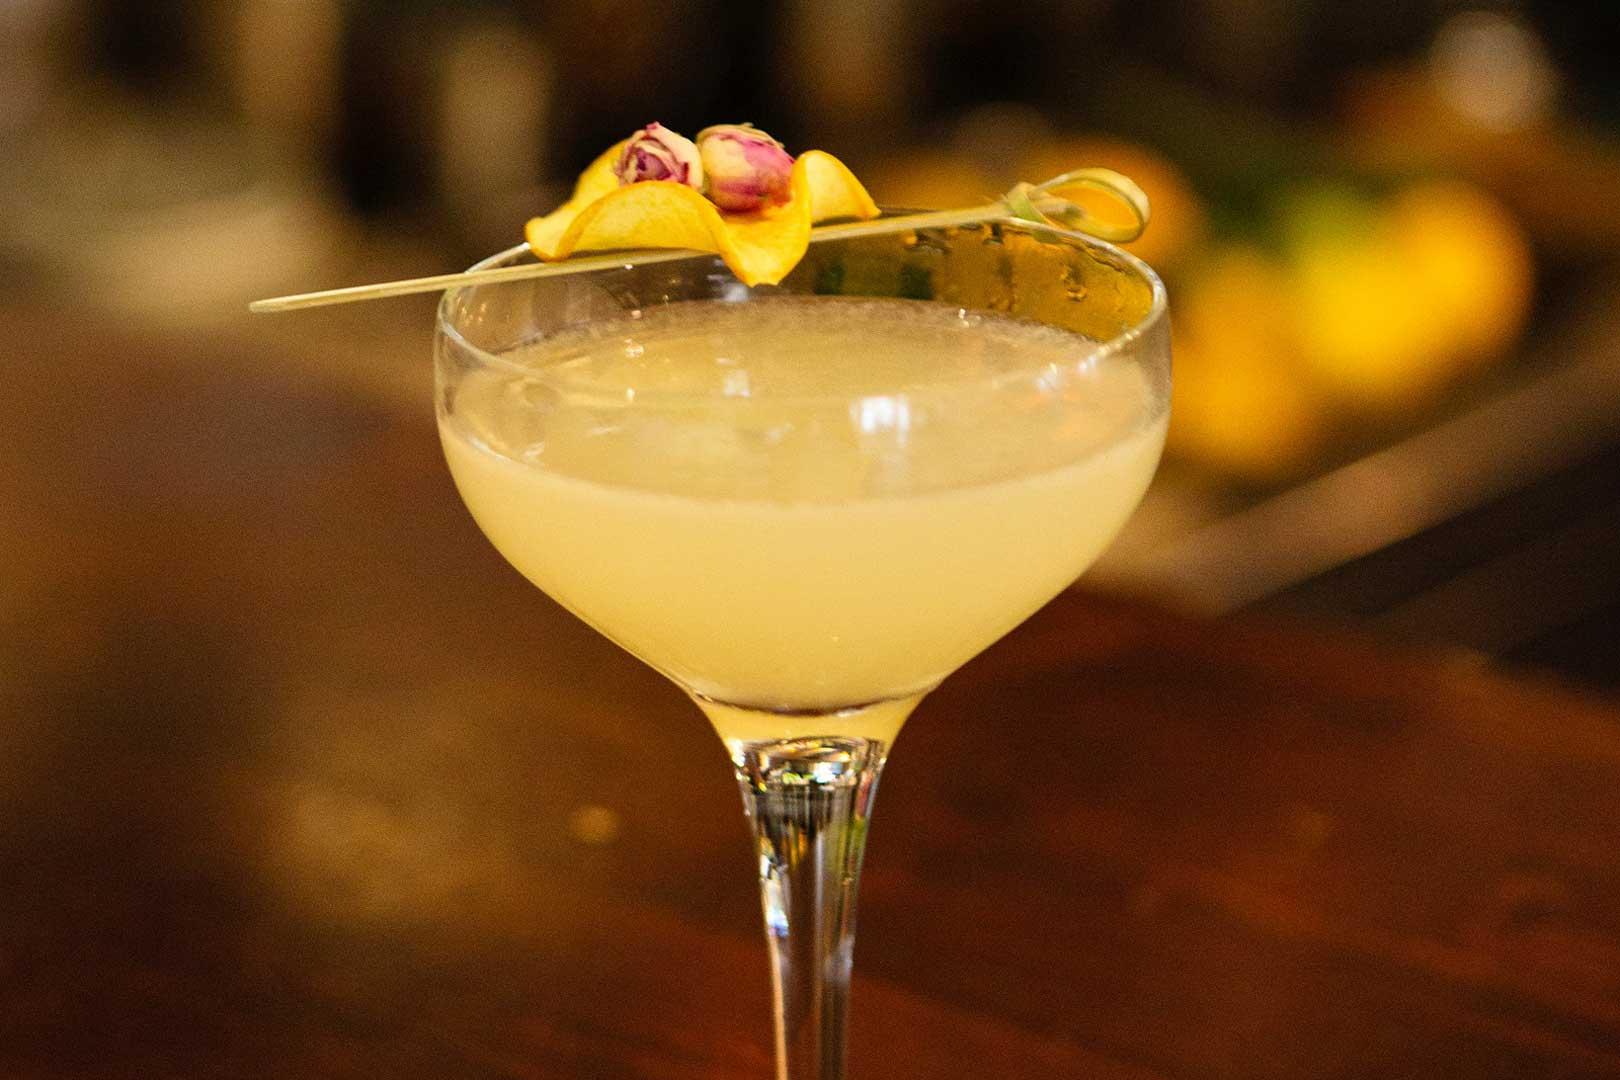 I 10 migliori cocktail bar in Porta Venezia - Eppol